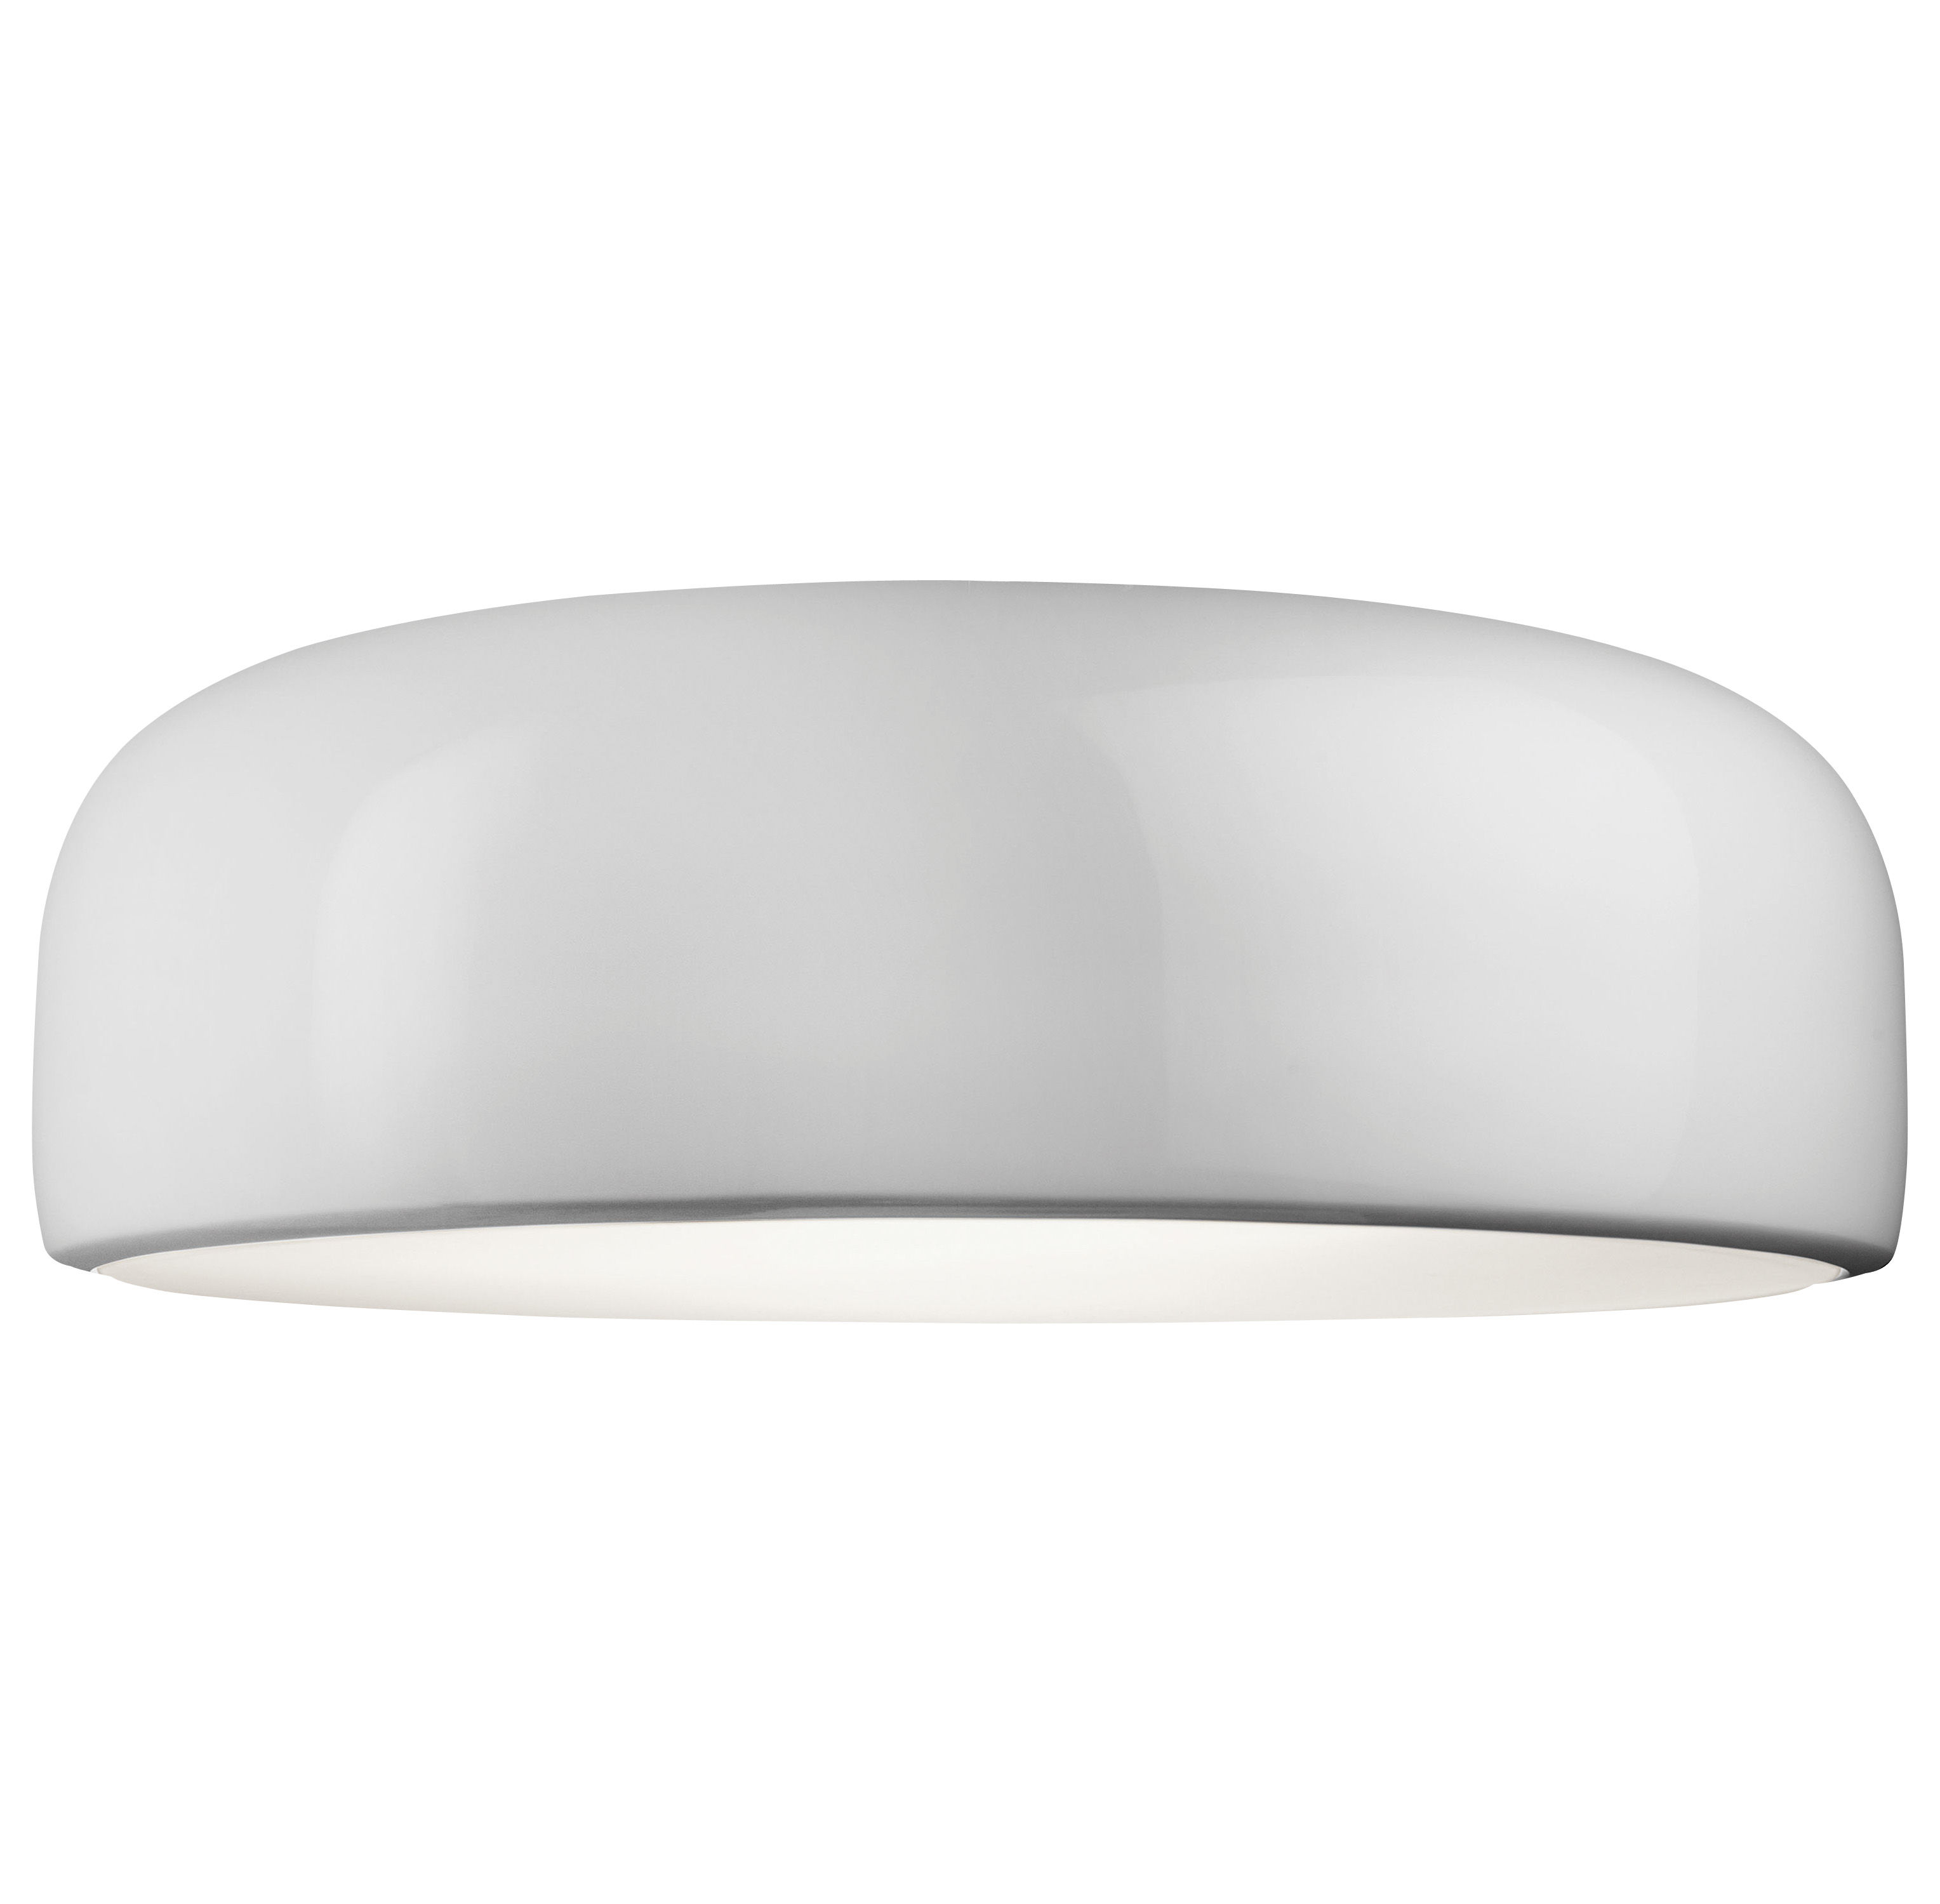 Luminaire - Plafonniers - Plafonnier Smithfield Pro / LED - Flos - Blanc - Aluminium peint